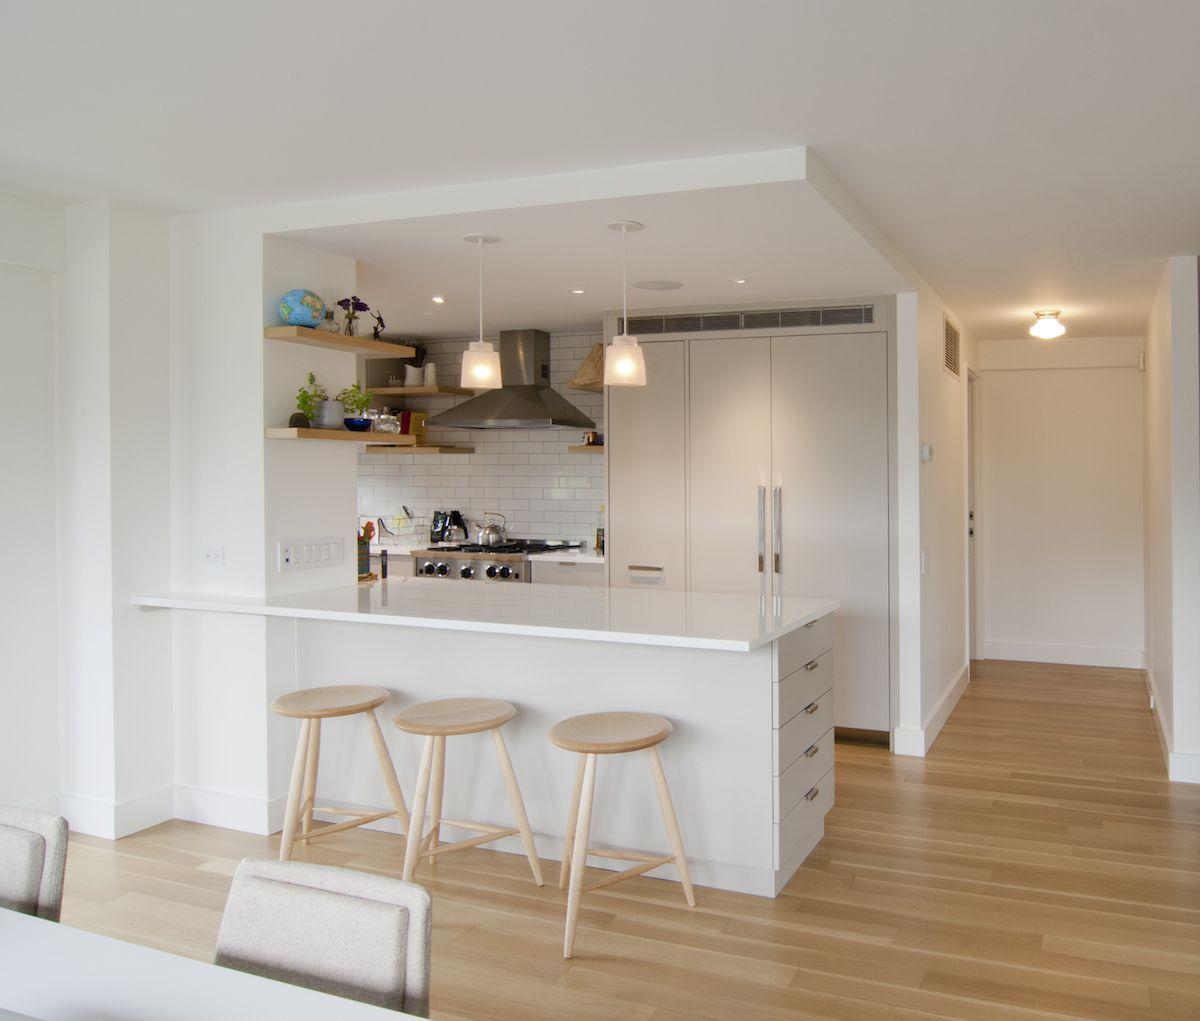 white kitchen with three stools